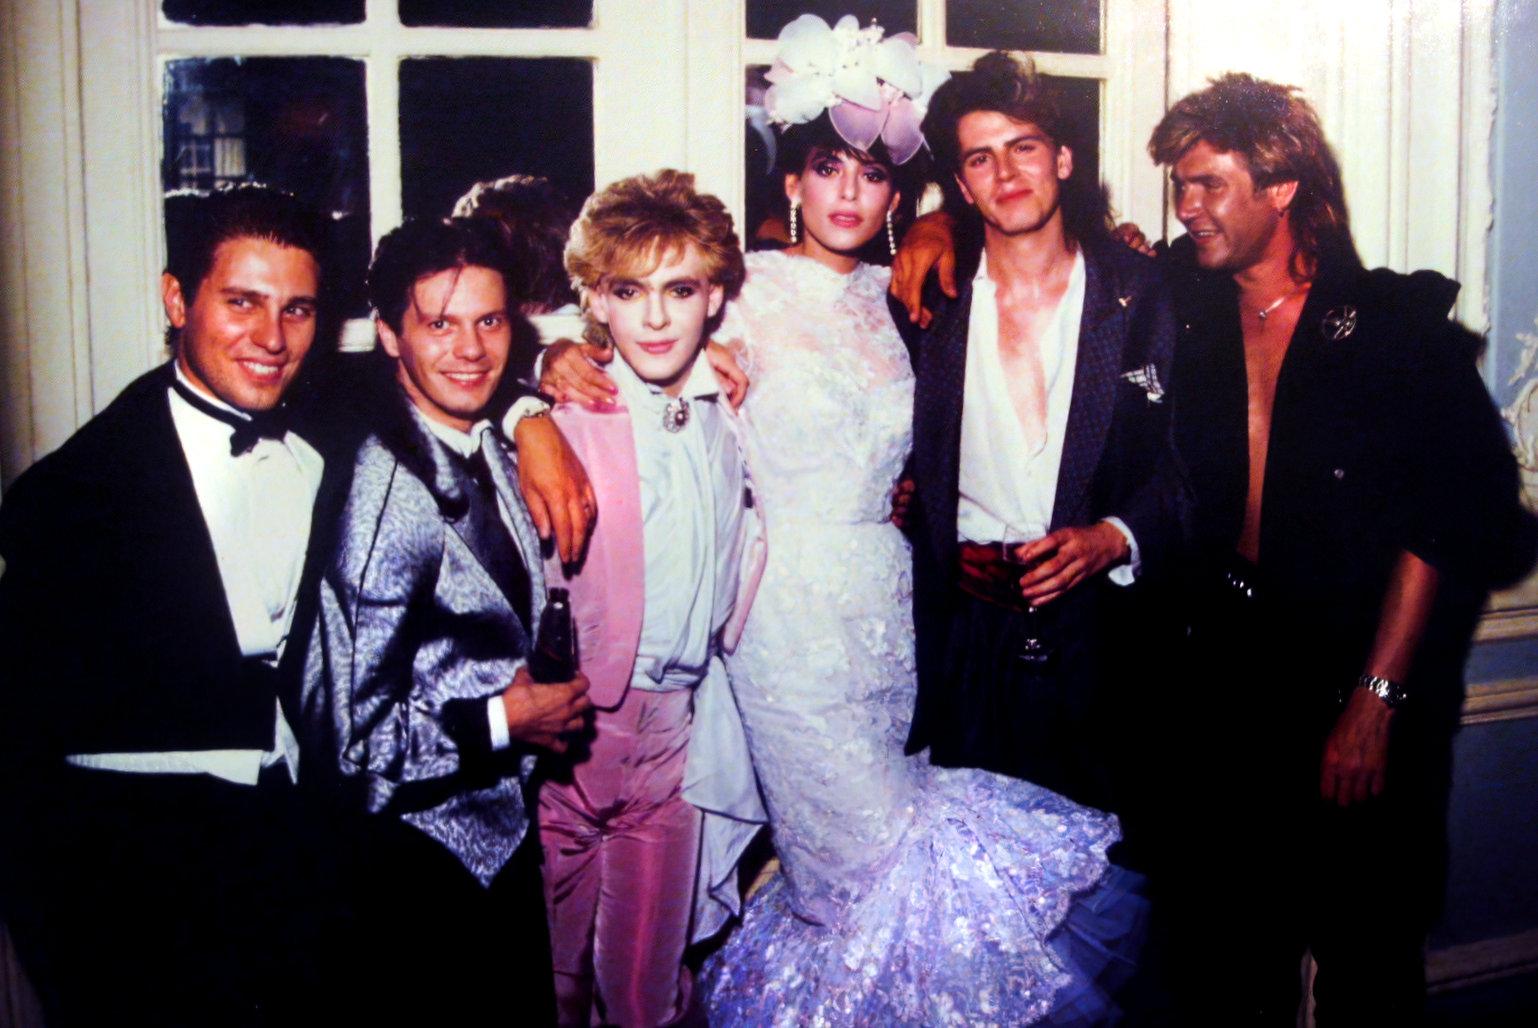 Nick Rhodes and Julie Ann Friedman wedding photo (1984)-gigapixel